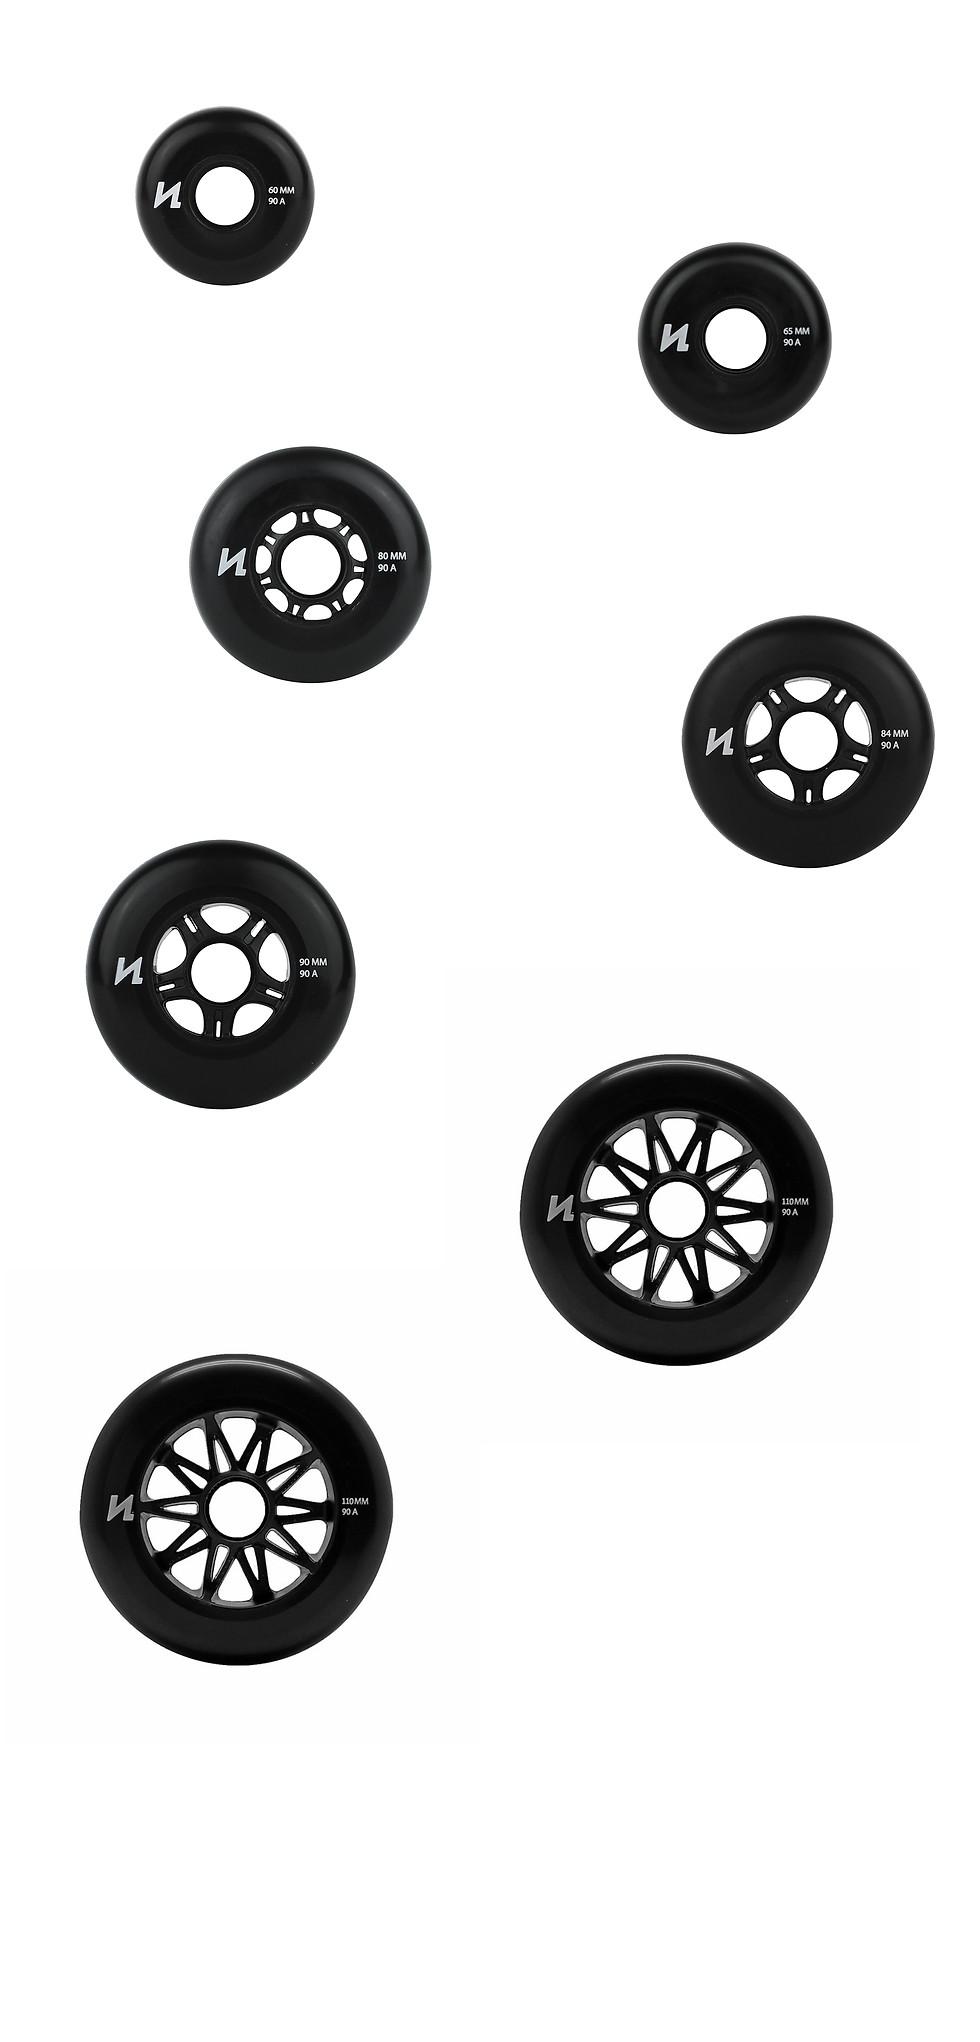 bachground wheel test2.jpg